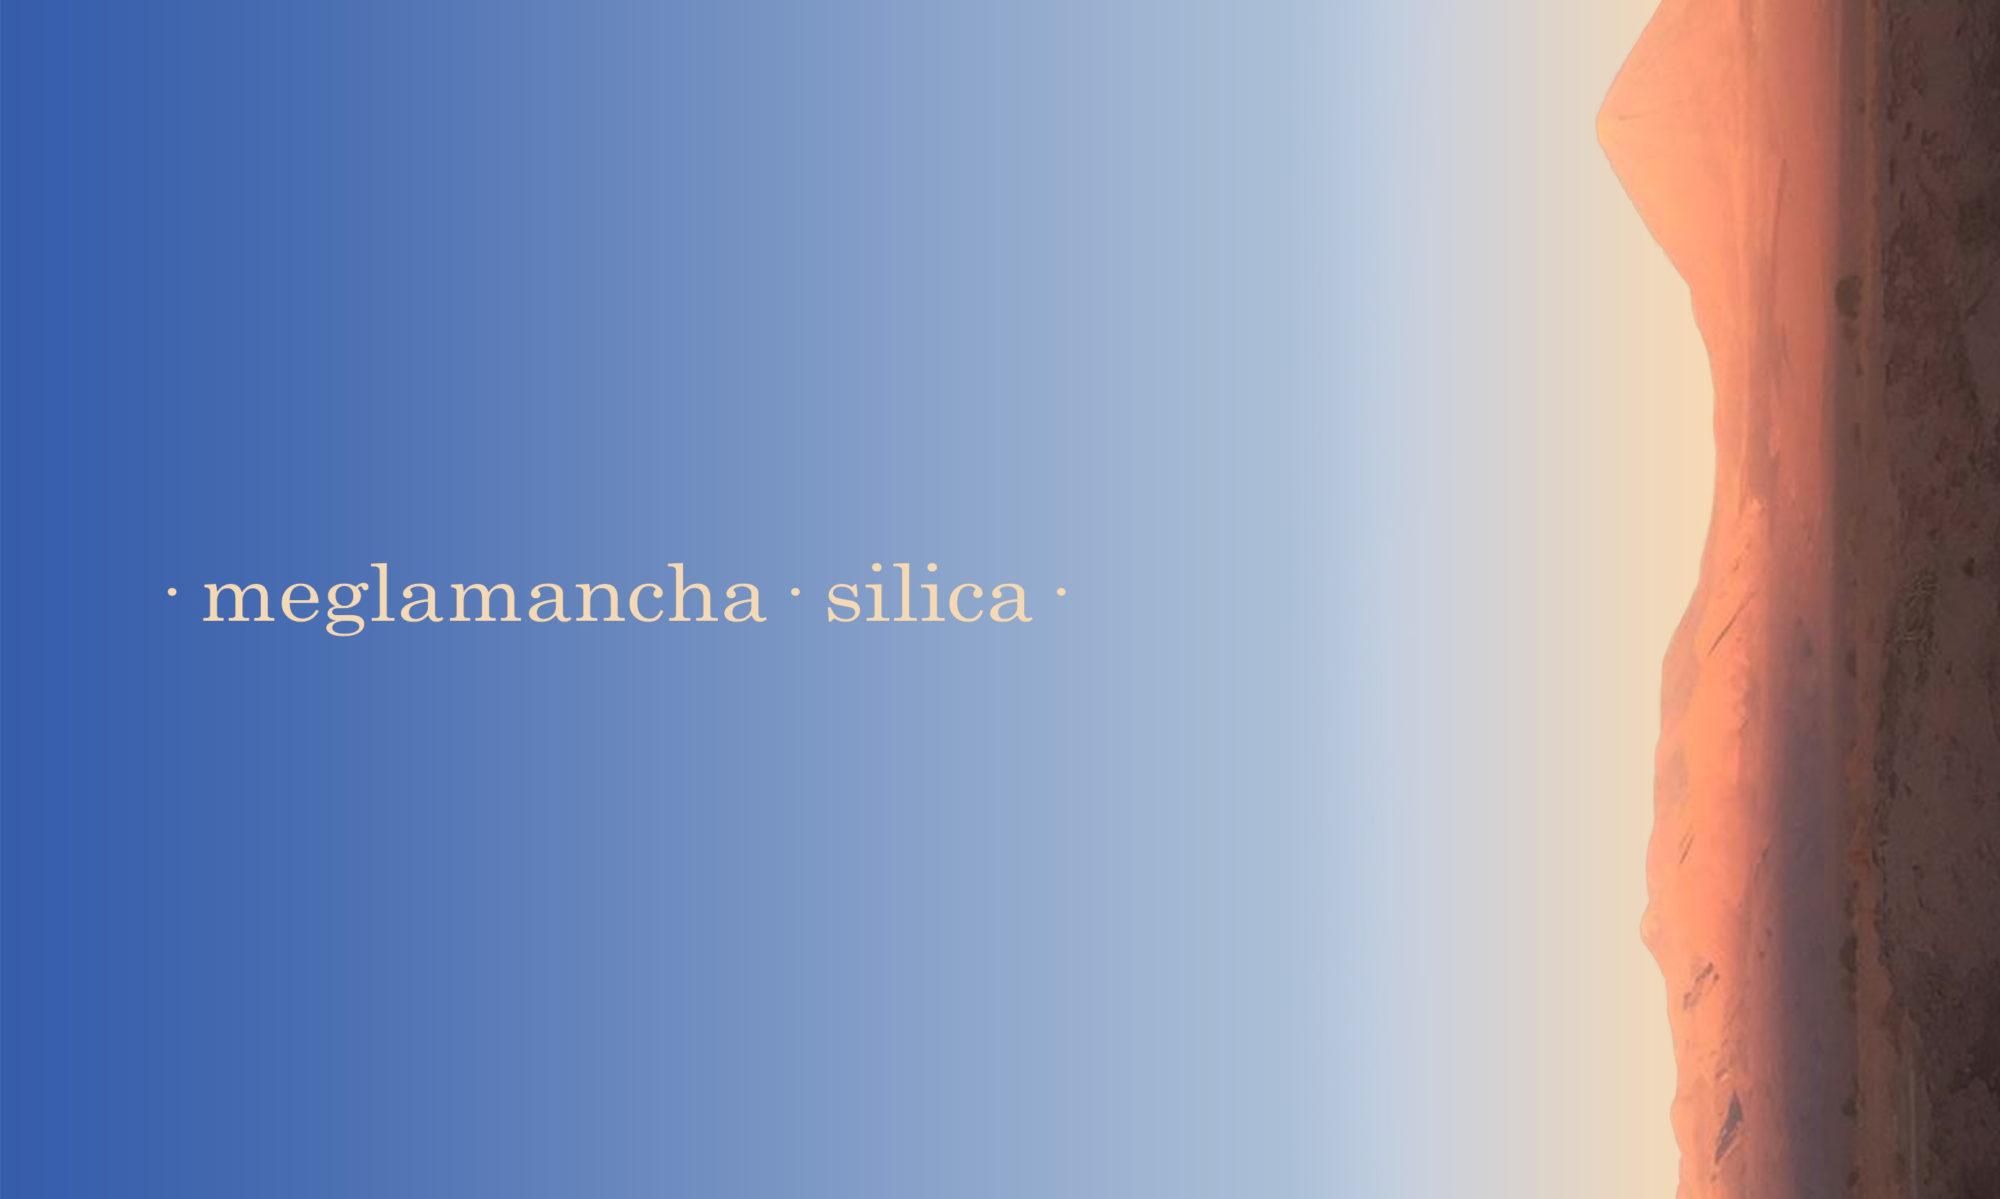 Meglamancha